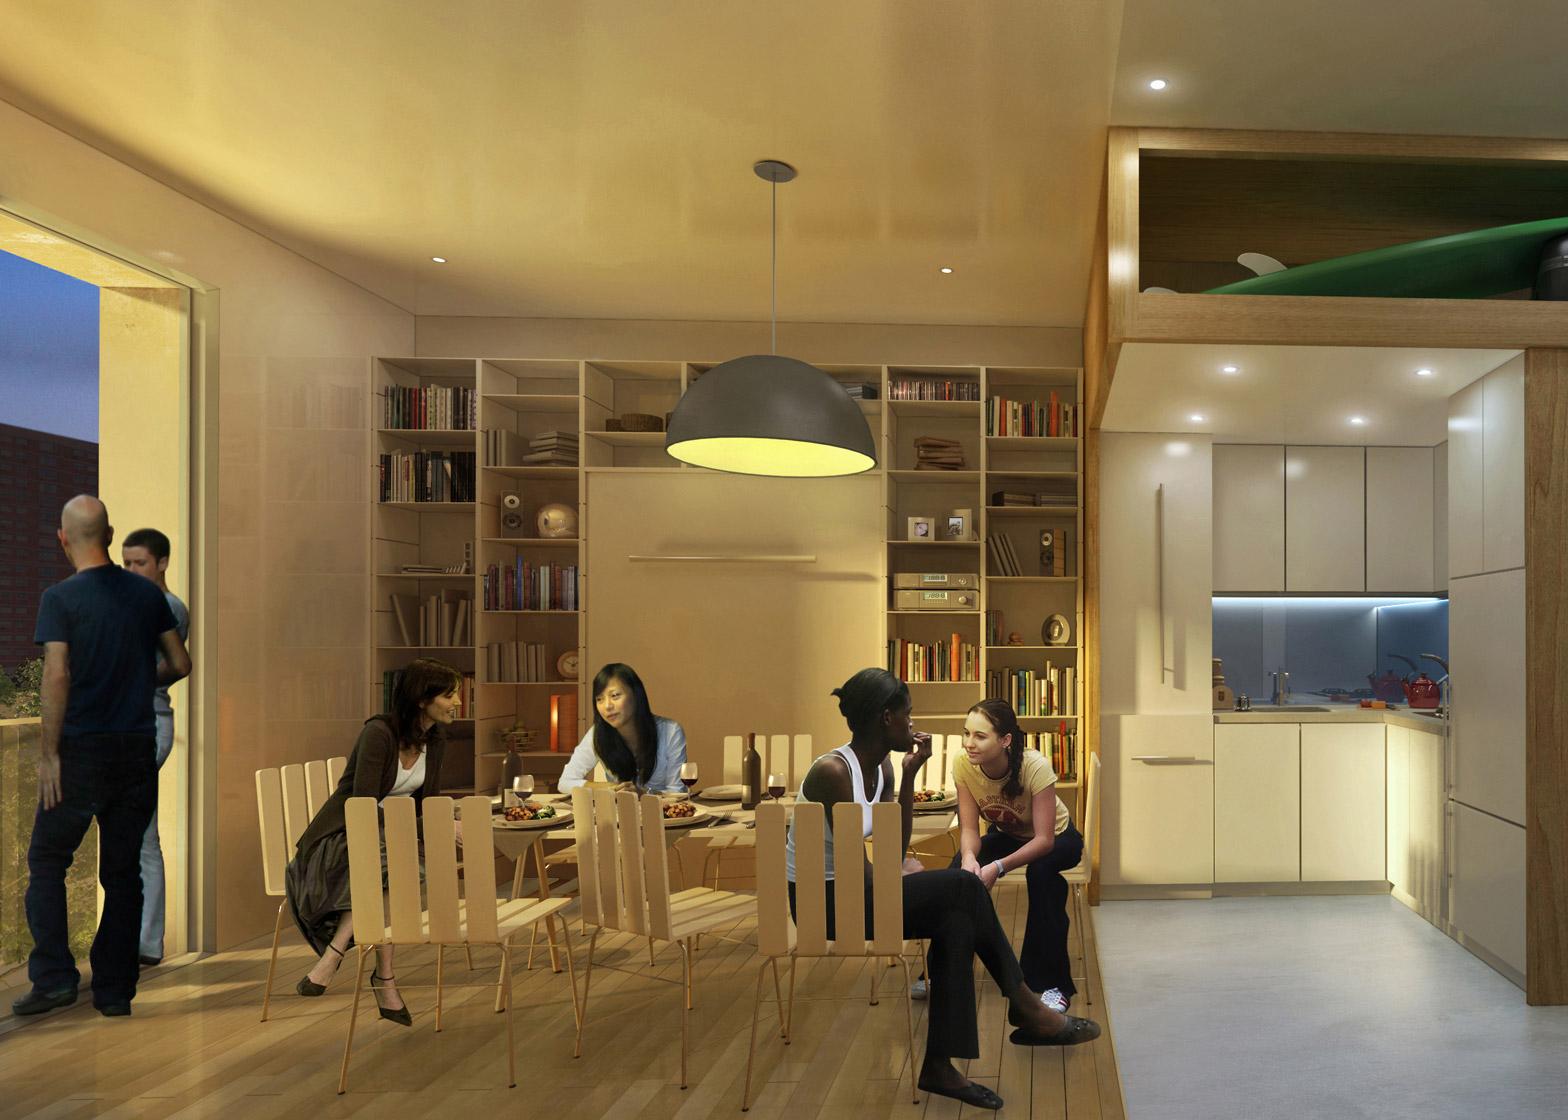 My-Micro-NY-apartment-building_nArchitects_New-York_dezeen_1568_4